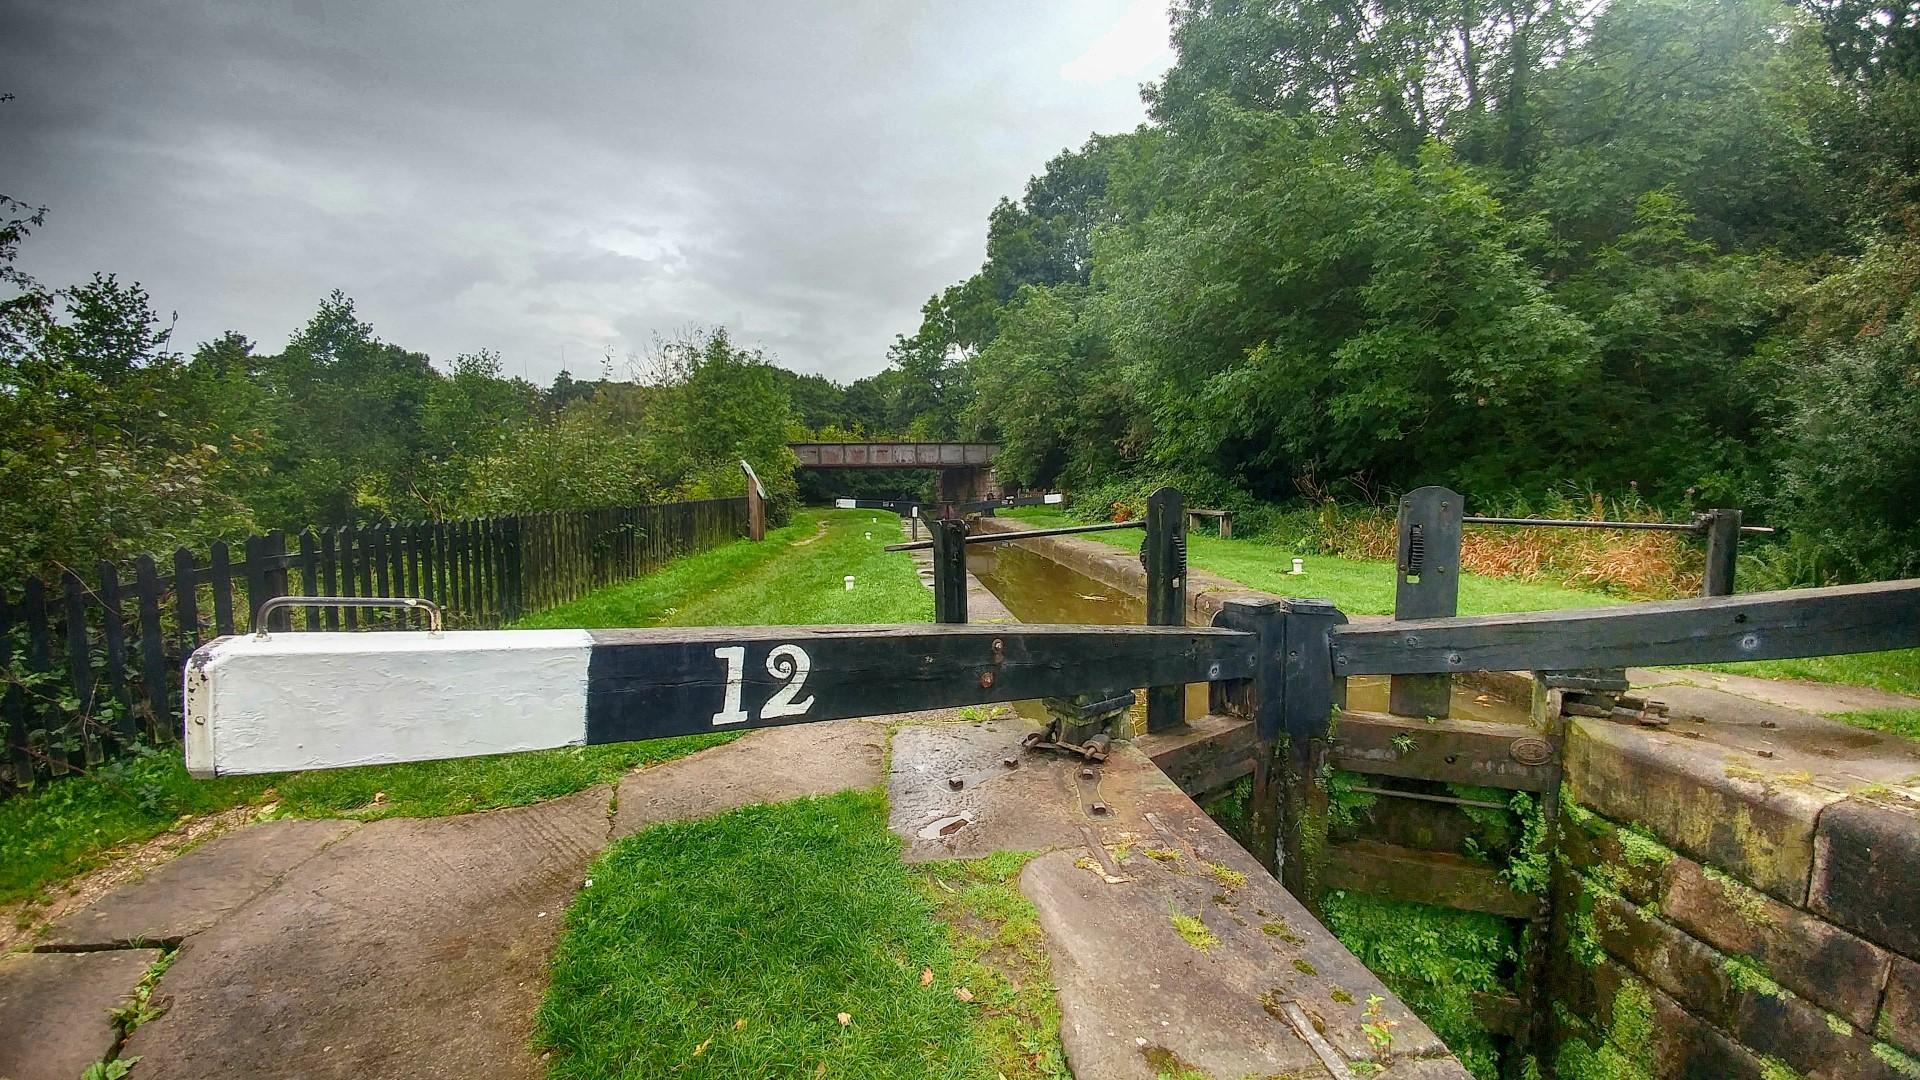 Lock 12 at Bosley Locks